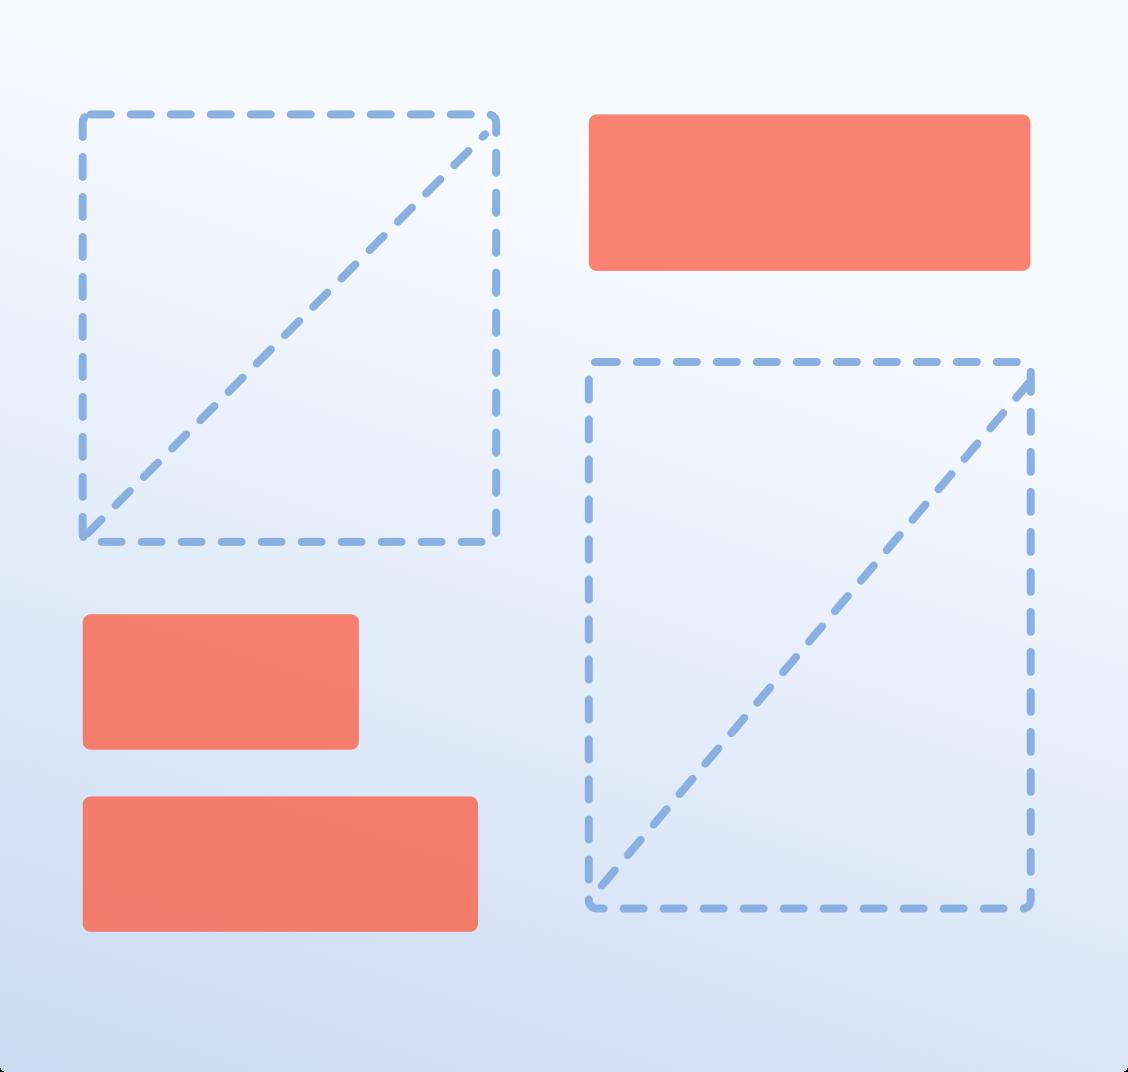 Illustration of a UI screen